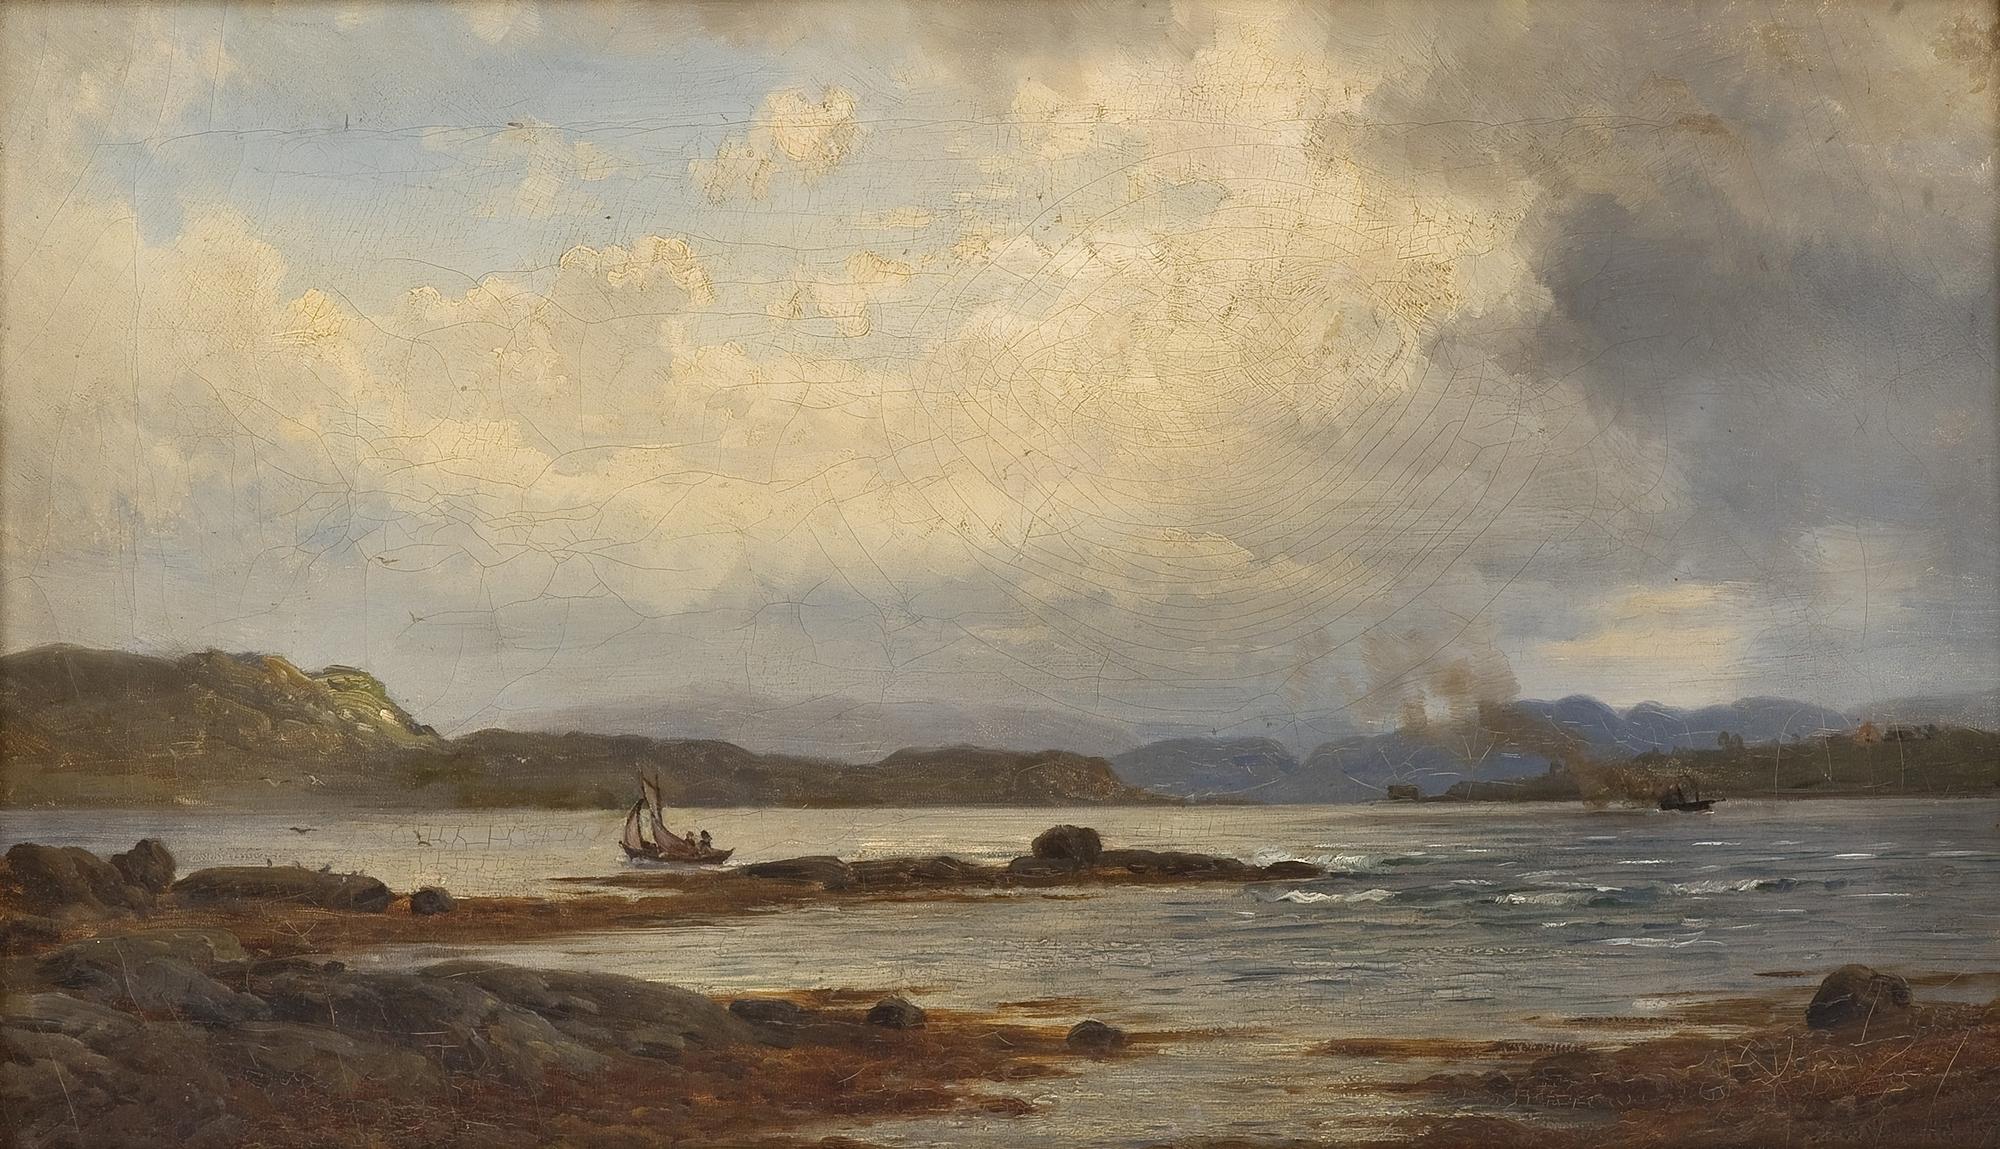 Андерс Аскевольд картина From Prestøen in Sundfjord 1878 морской пейзаж масло холст